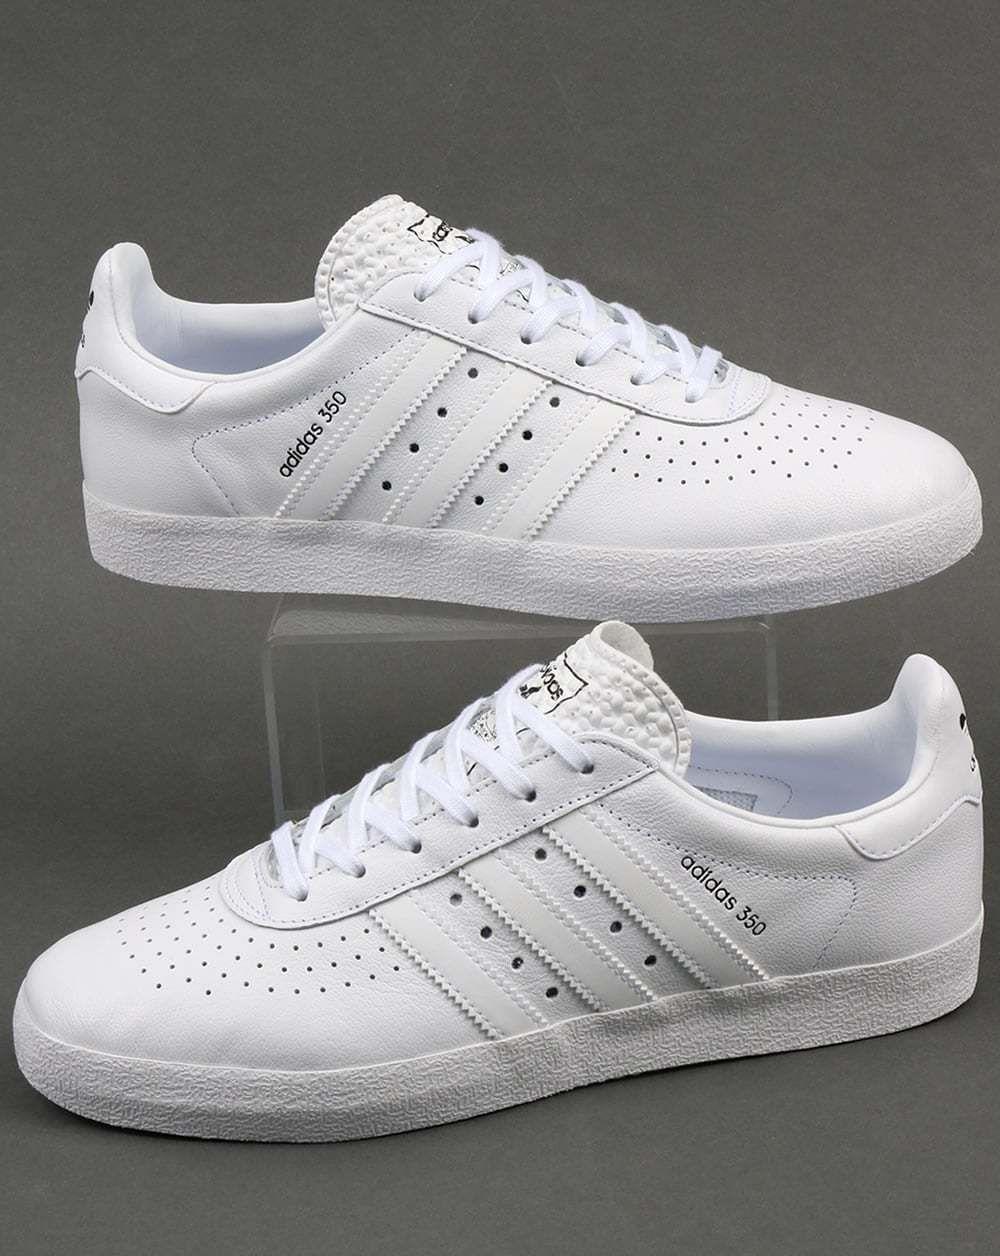 Adidas Originals - Adidas 350 Trainers